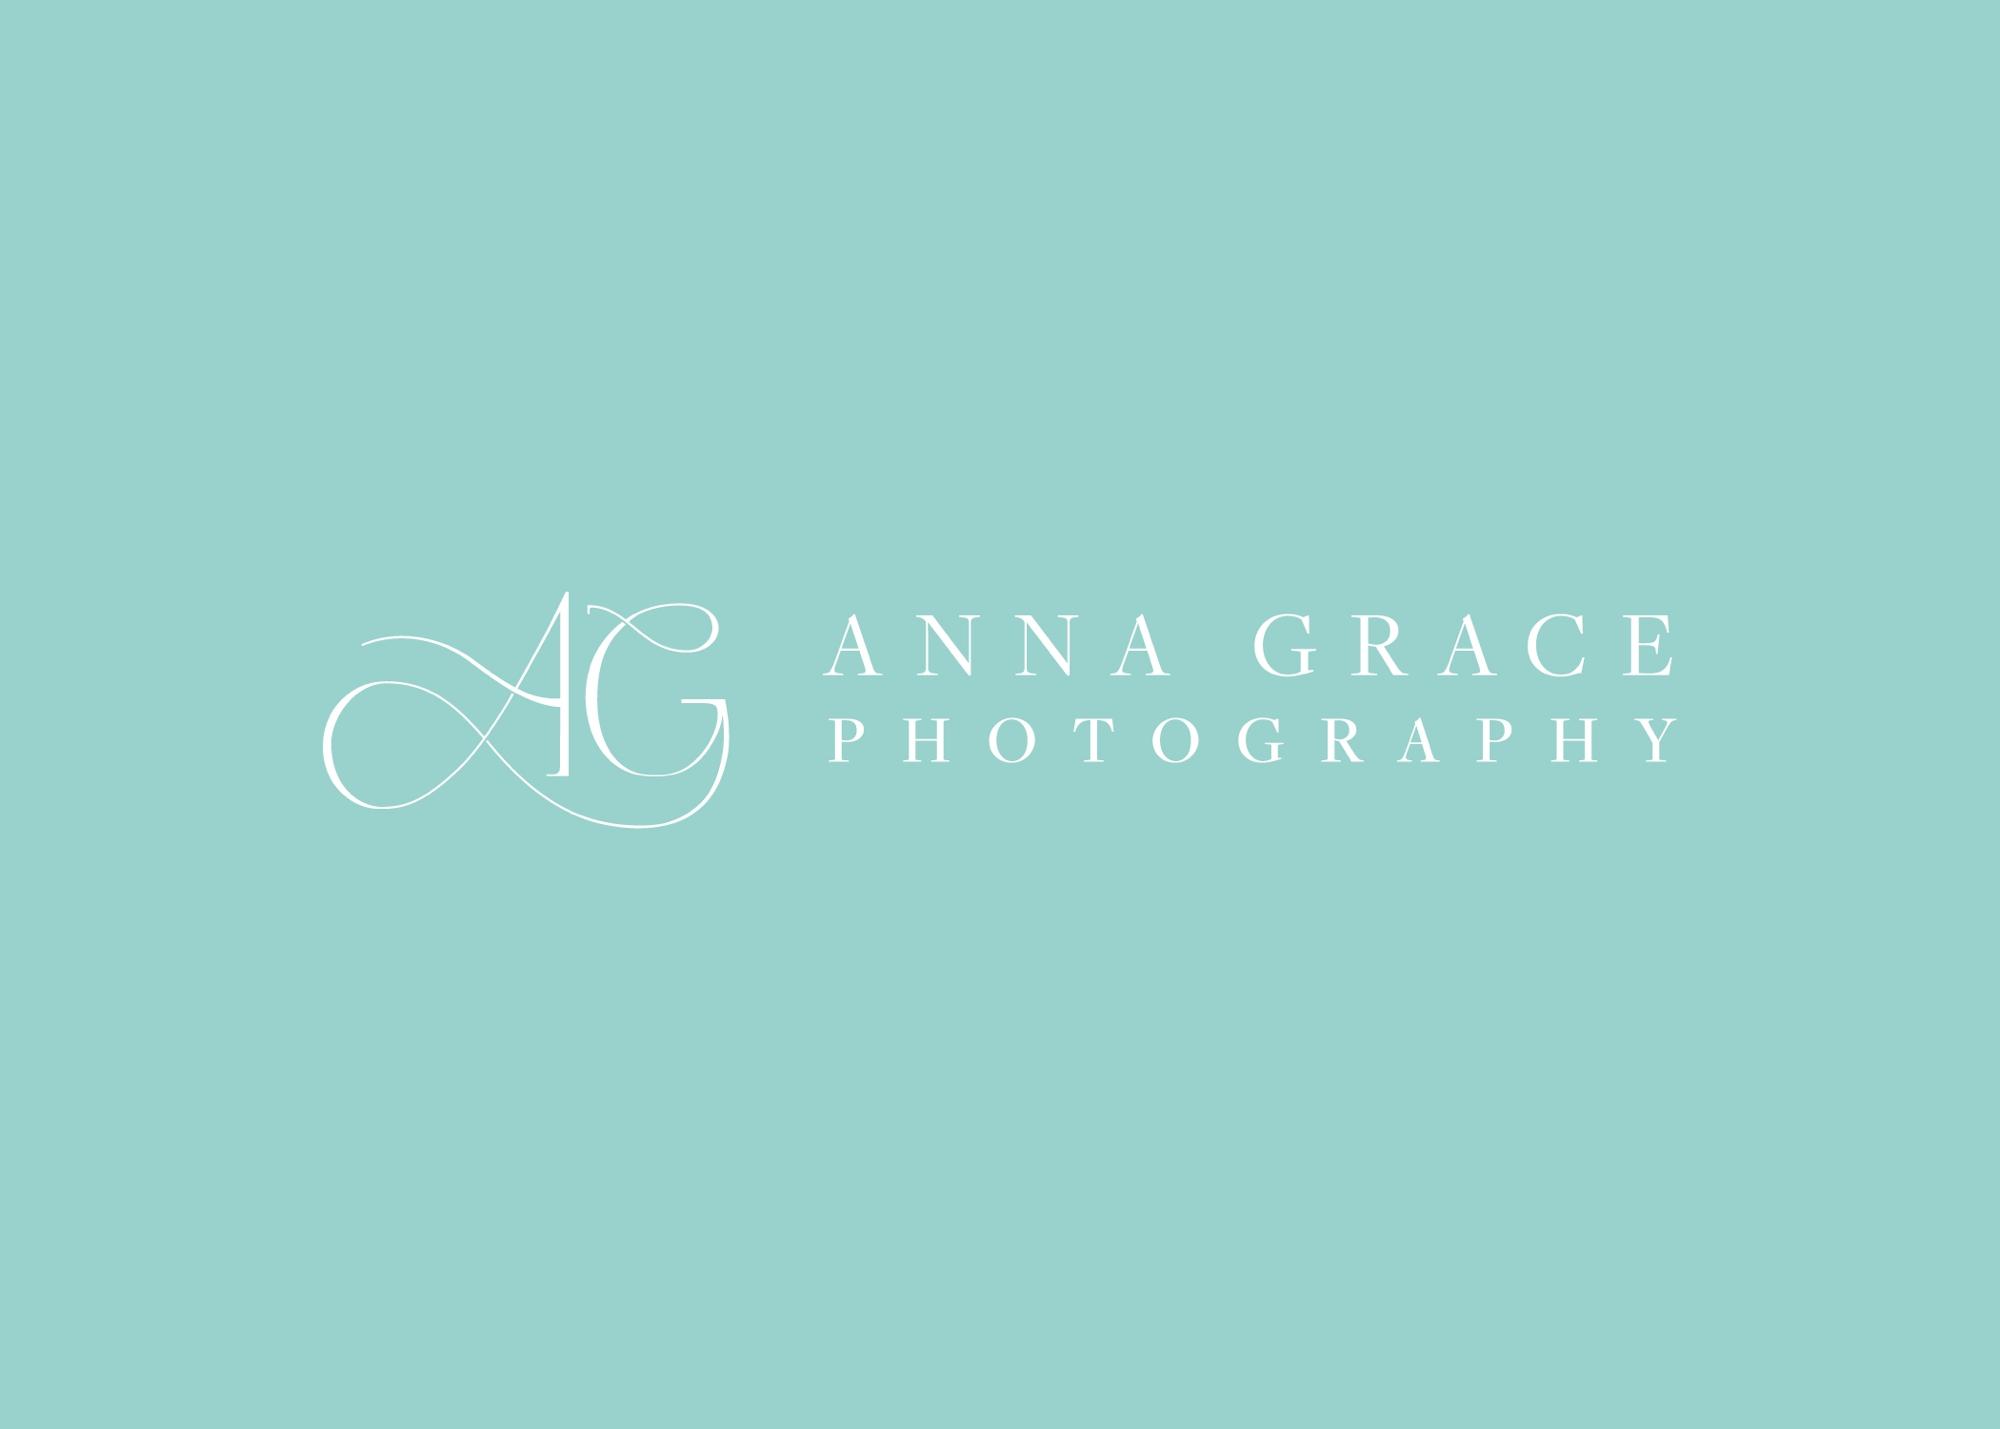 AGP Logo Concepts PB&J ROUND2-01_anna grace photography maryland newborn photographer photo copy.jpg